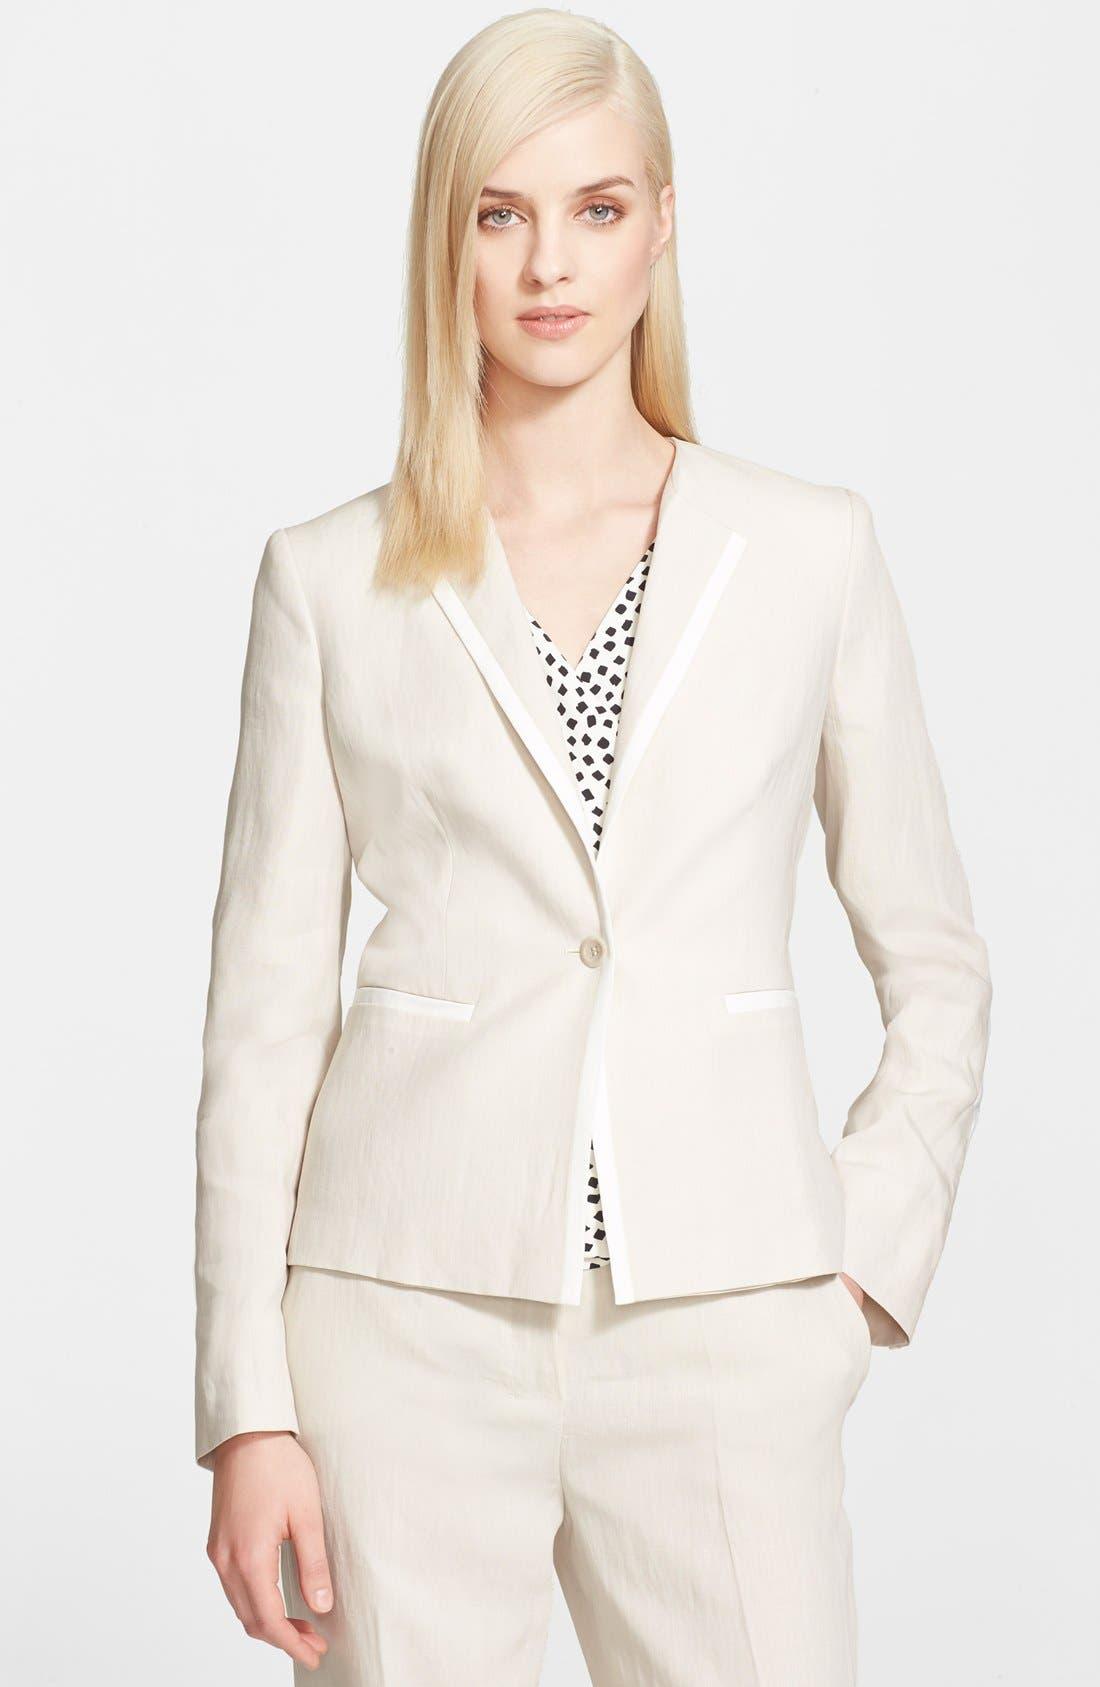 Main Image - Max Mara 'Ghinea' One-Button Linen Jacket